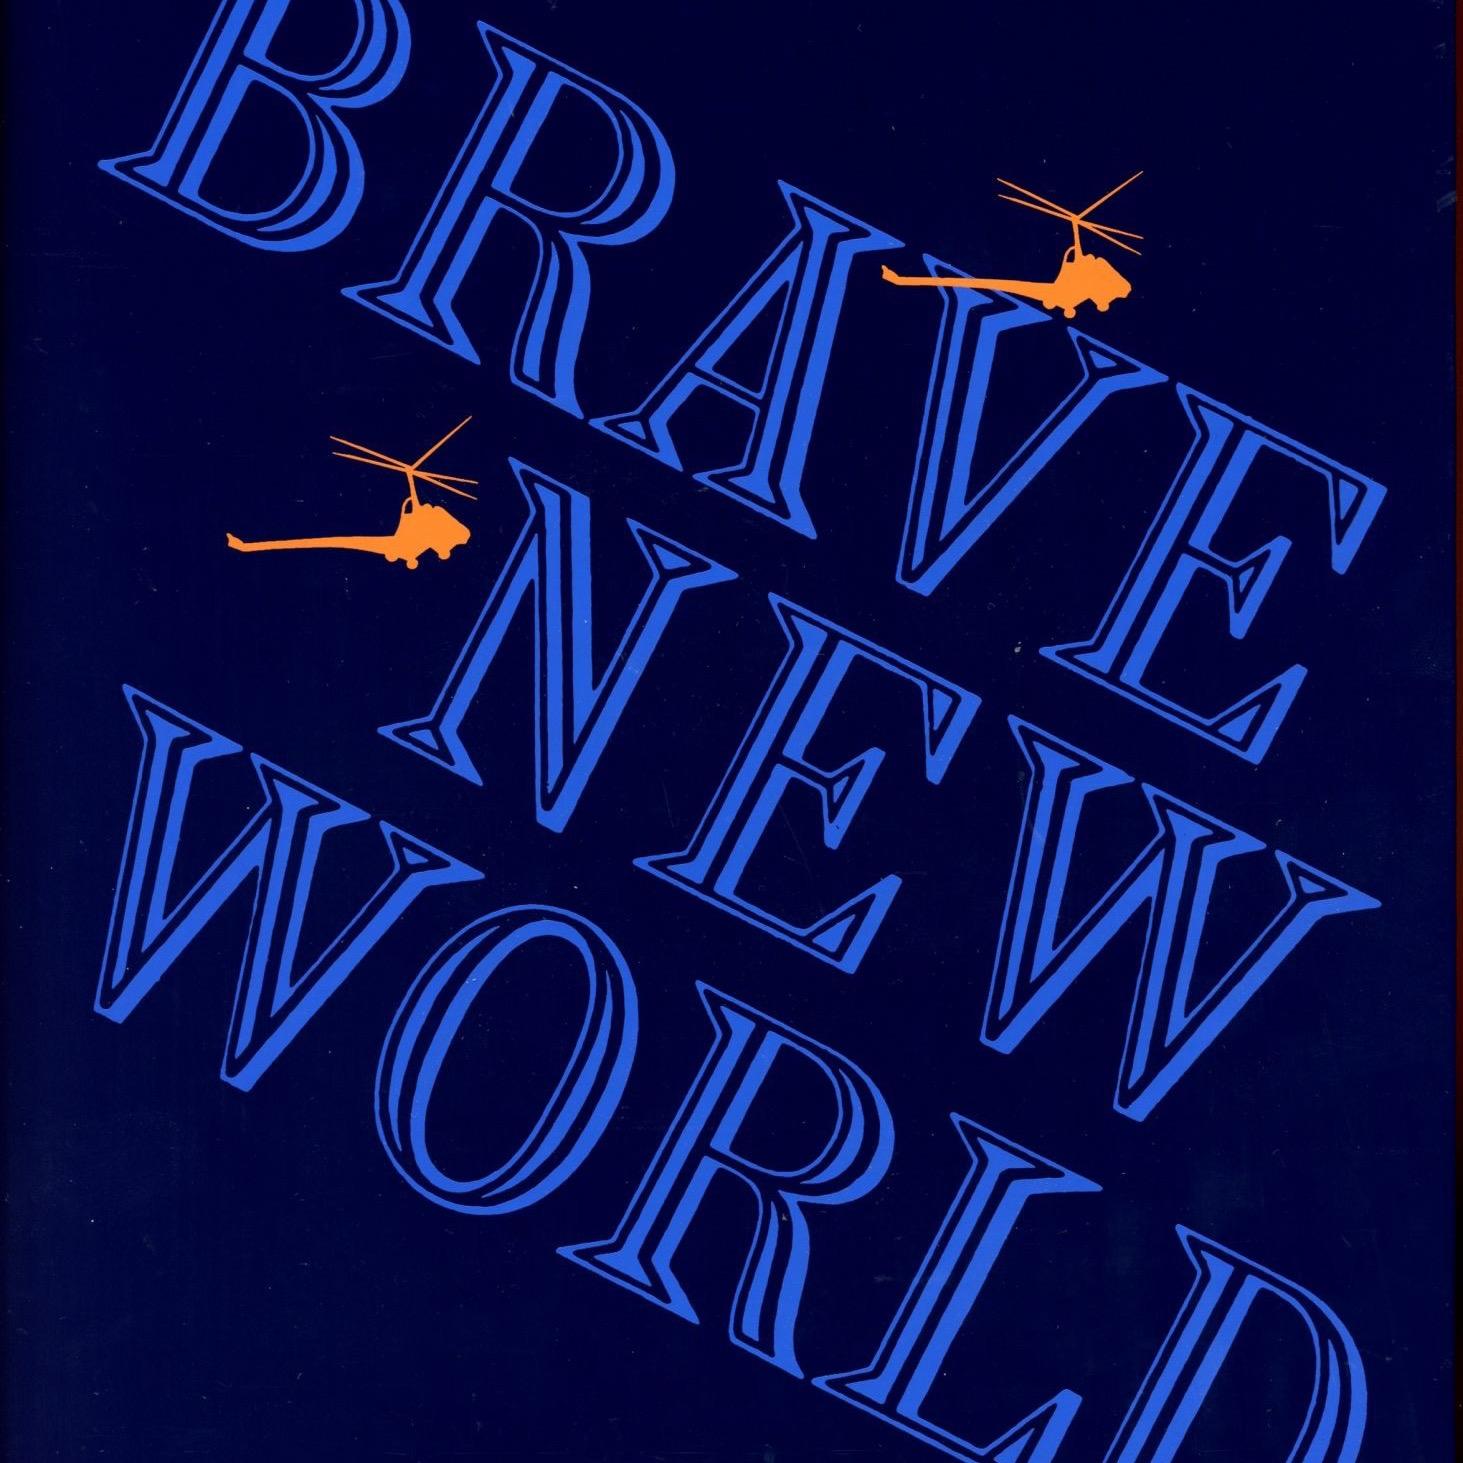 Brave New World:Aldous Huxley